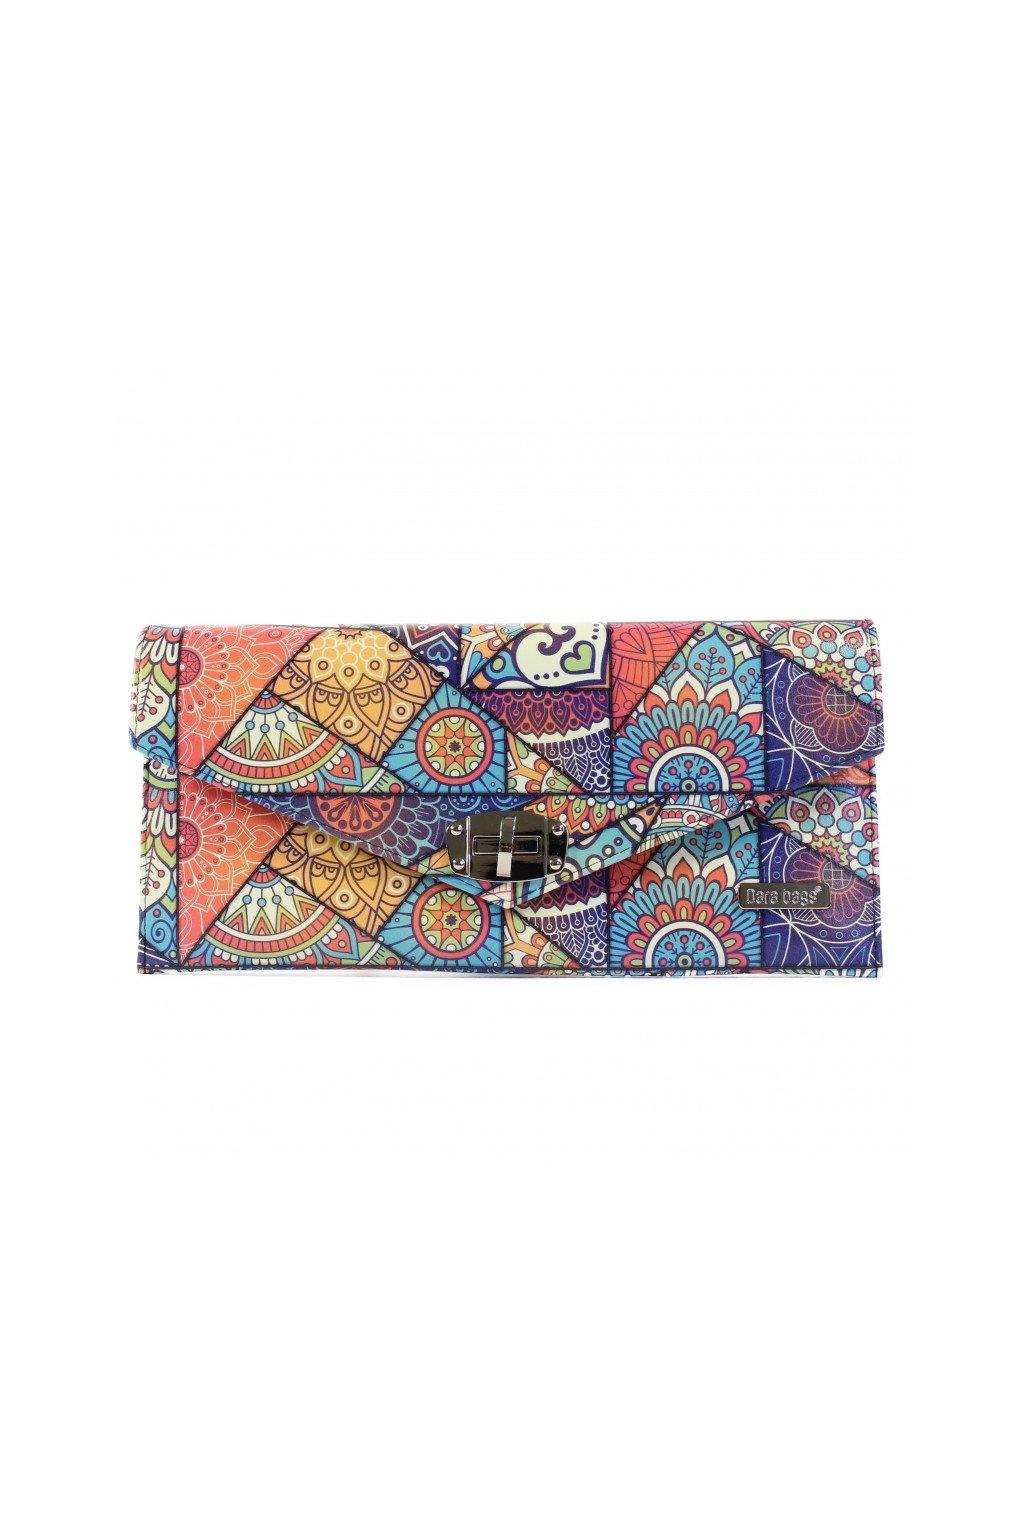 Pestrobarevna kabelka Malibu Classy modra 1